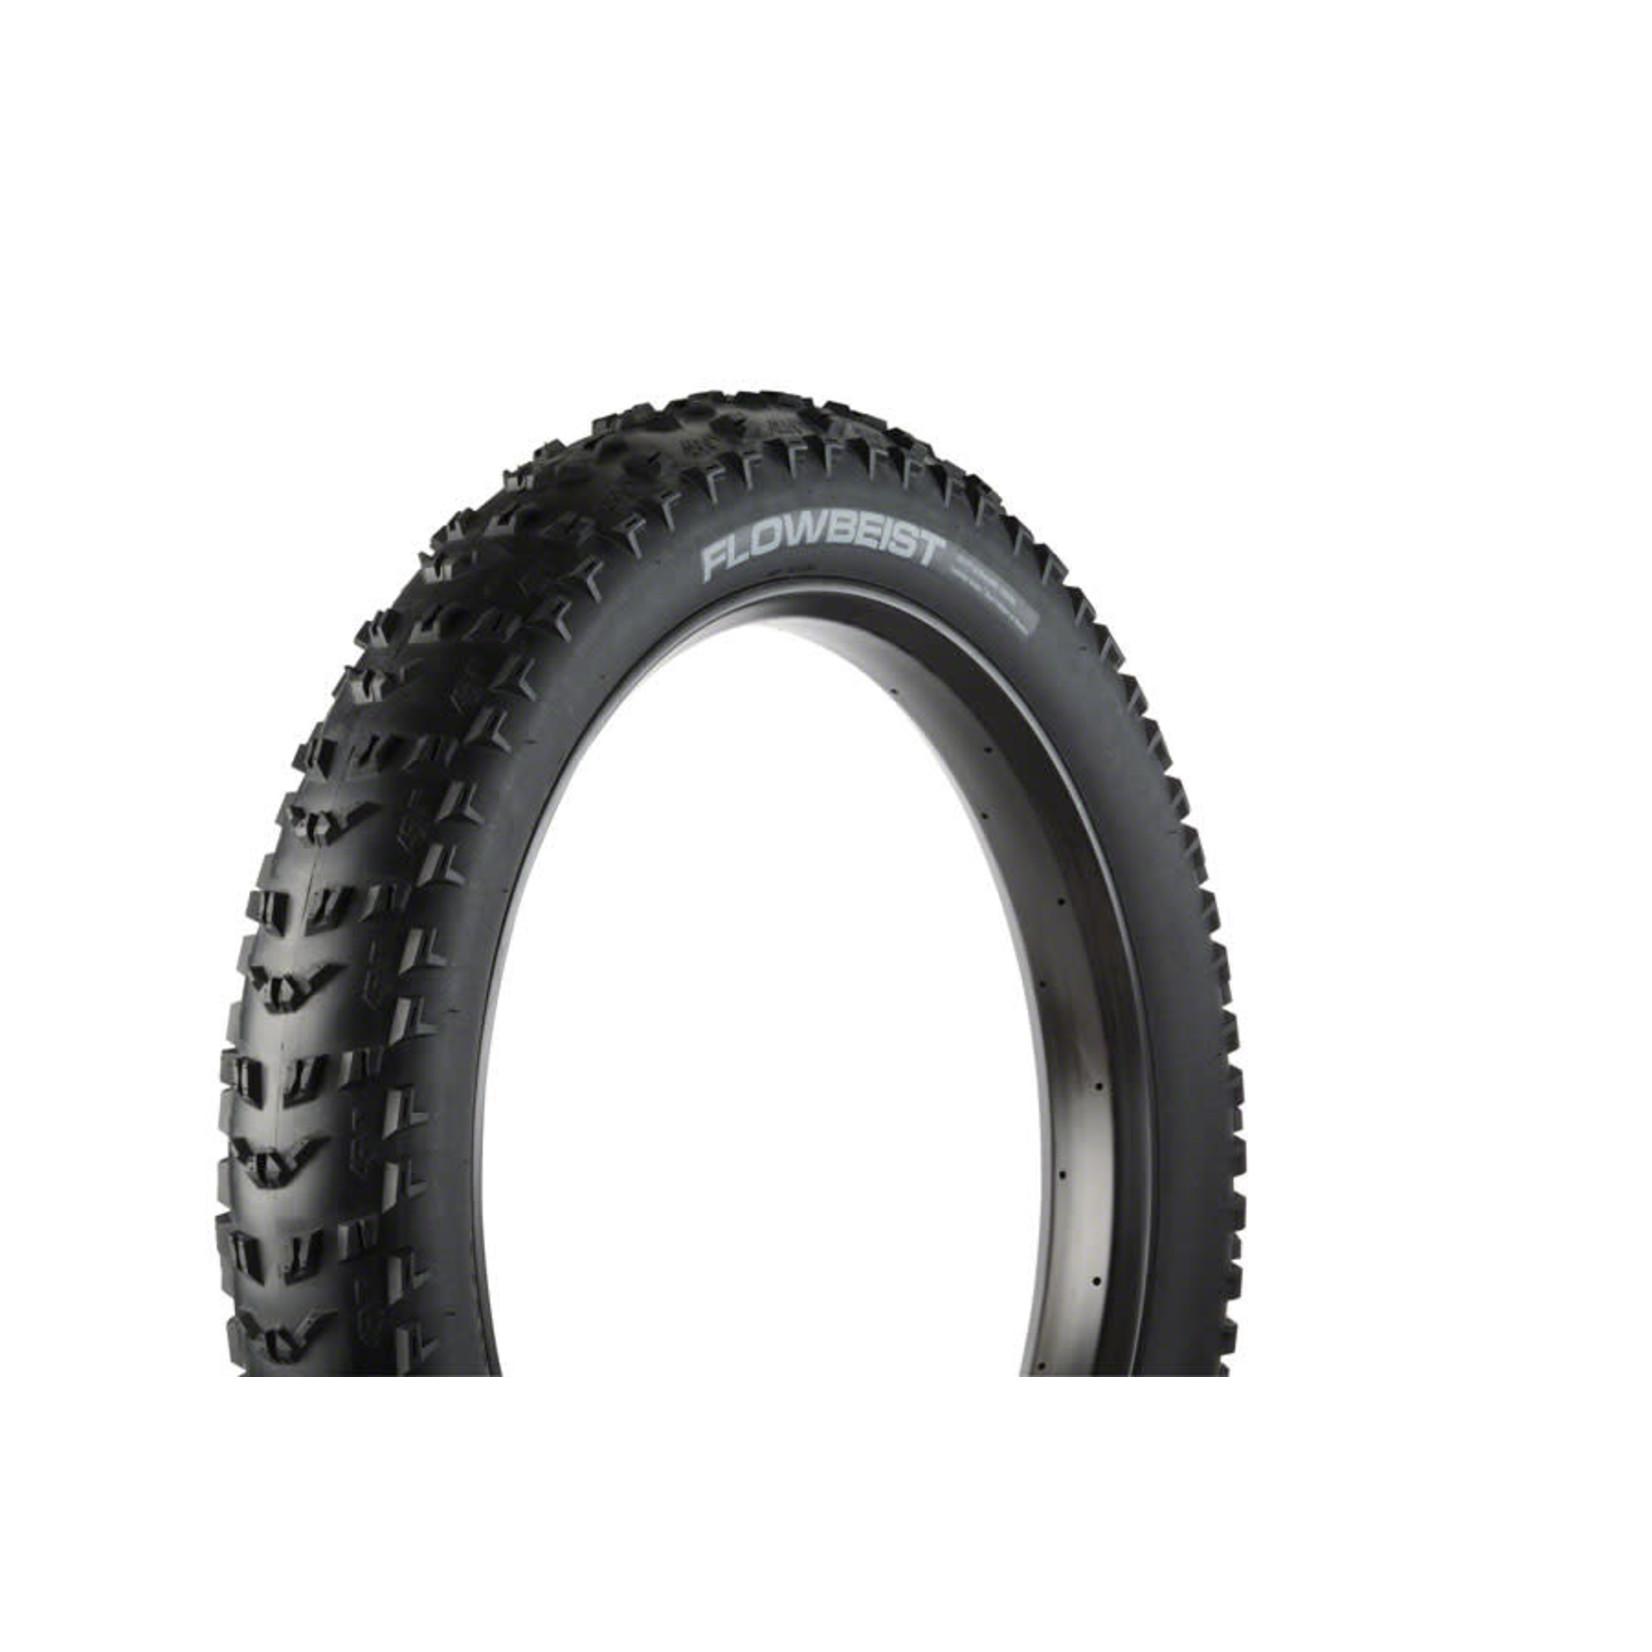 "45NRTH 45NRTH Flowbeist 26x4.6"" Fatbike Tire 120tpi Tubeless Folding"